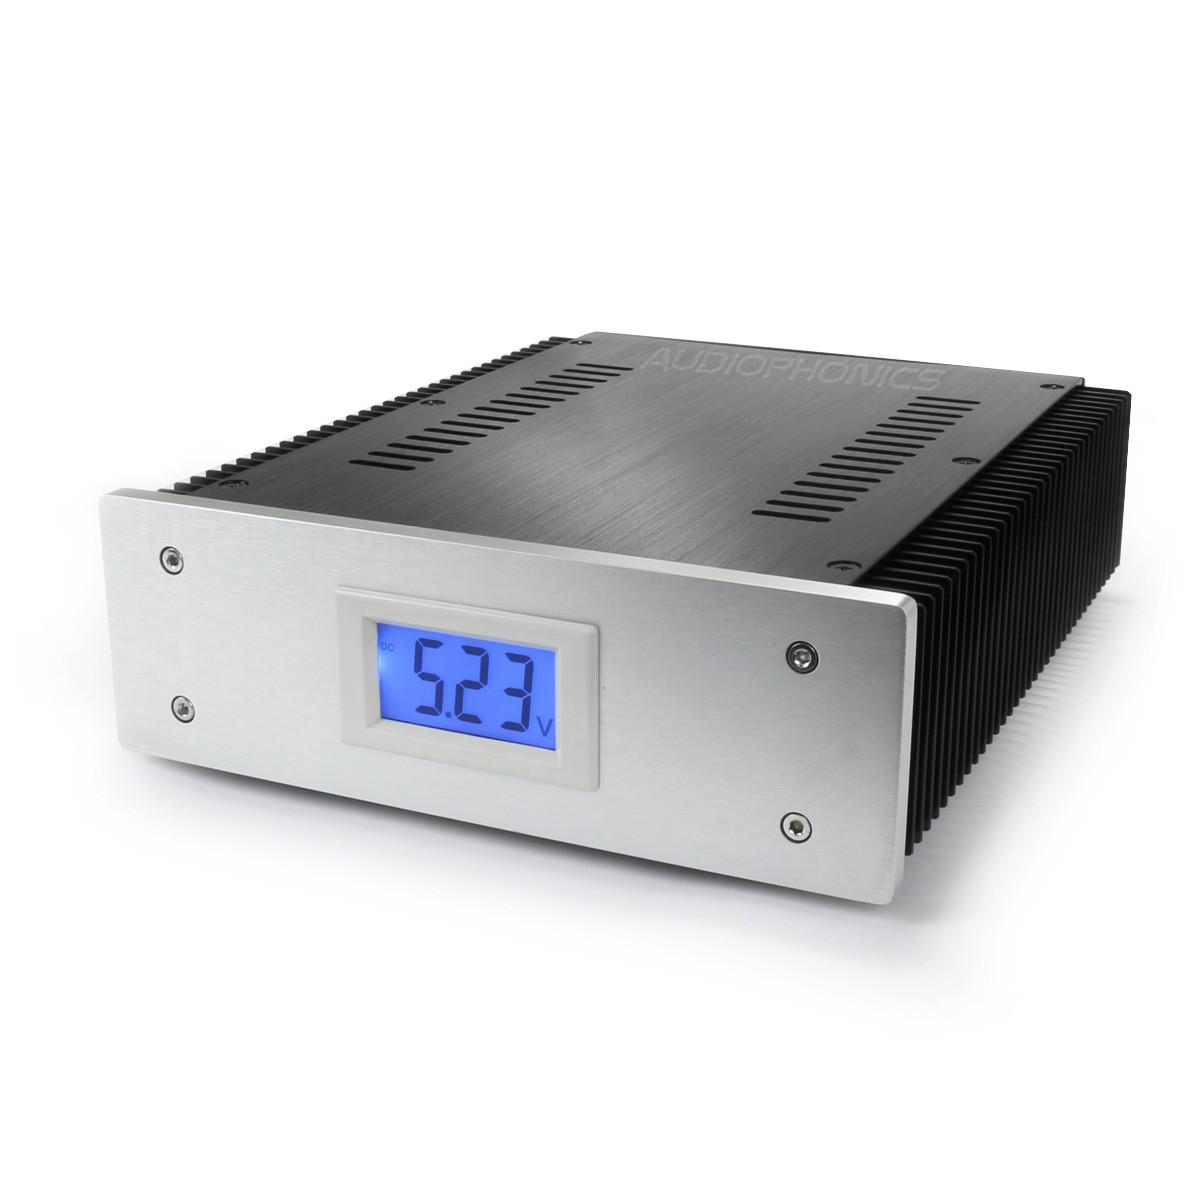 LPSU100 Linear stabilized power supply 5V 11A DAC / Docking